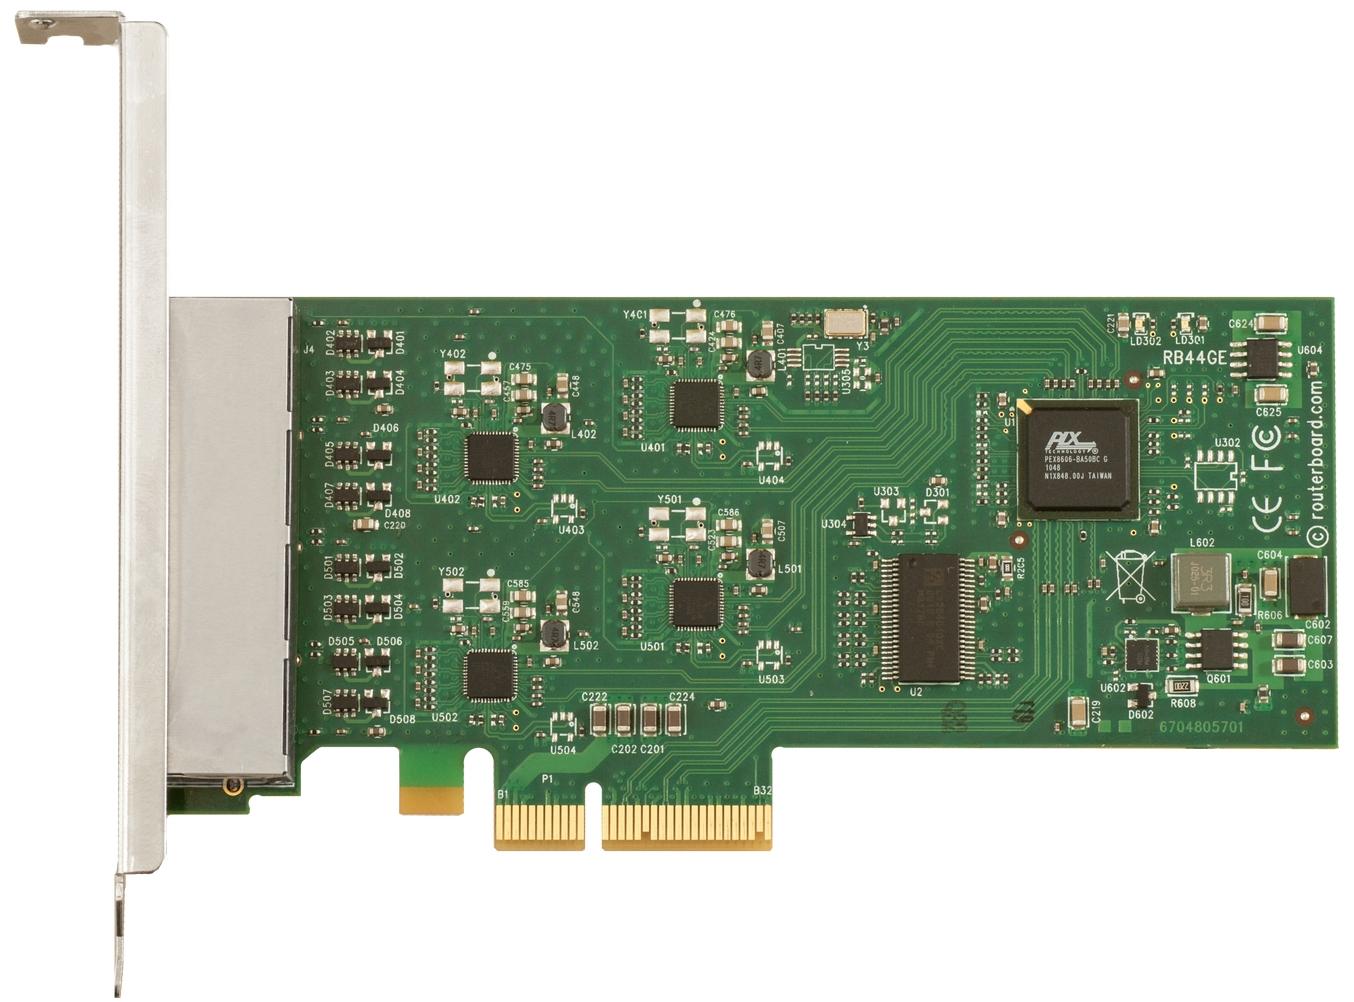 Specification Sheet Buy Online Rb44ge Mikrotik Routerboard 44ge Pci Lan Card Express Gigabit Tg 3468 Gallery Image 1 Size 1354 W X 1002 H